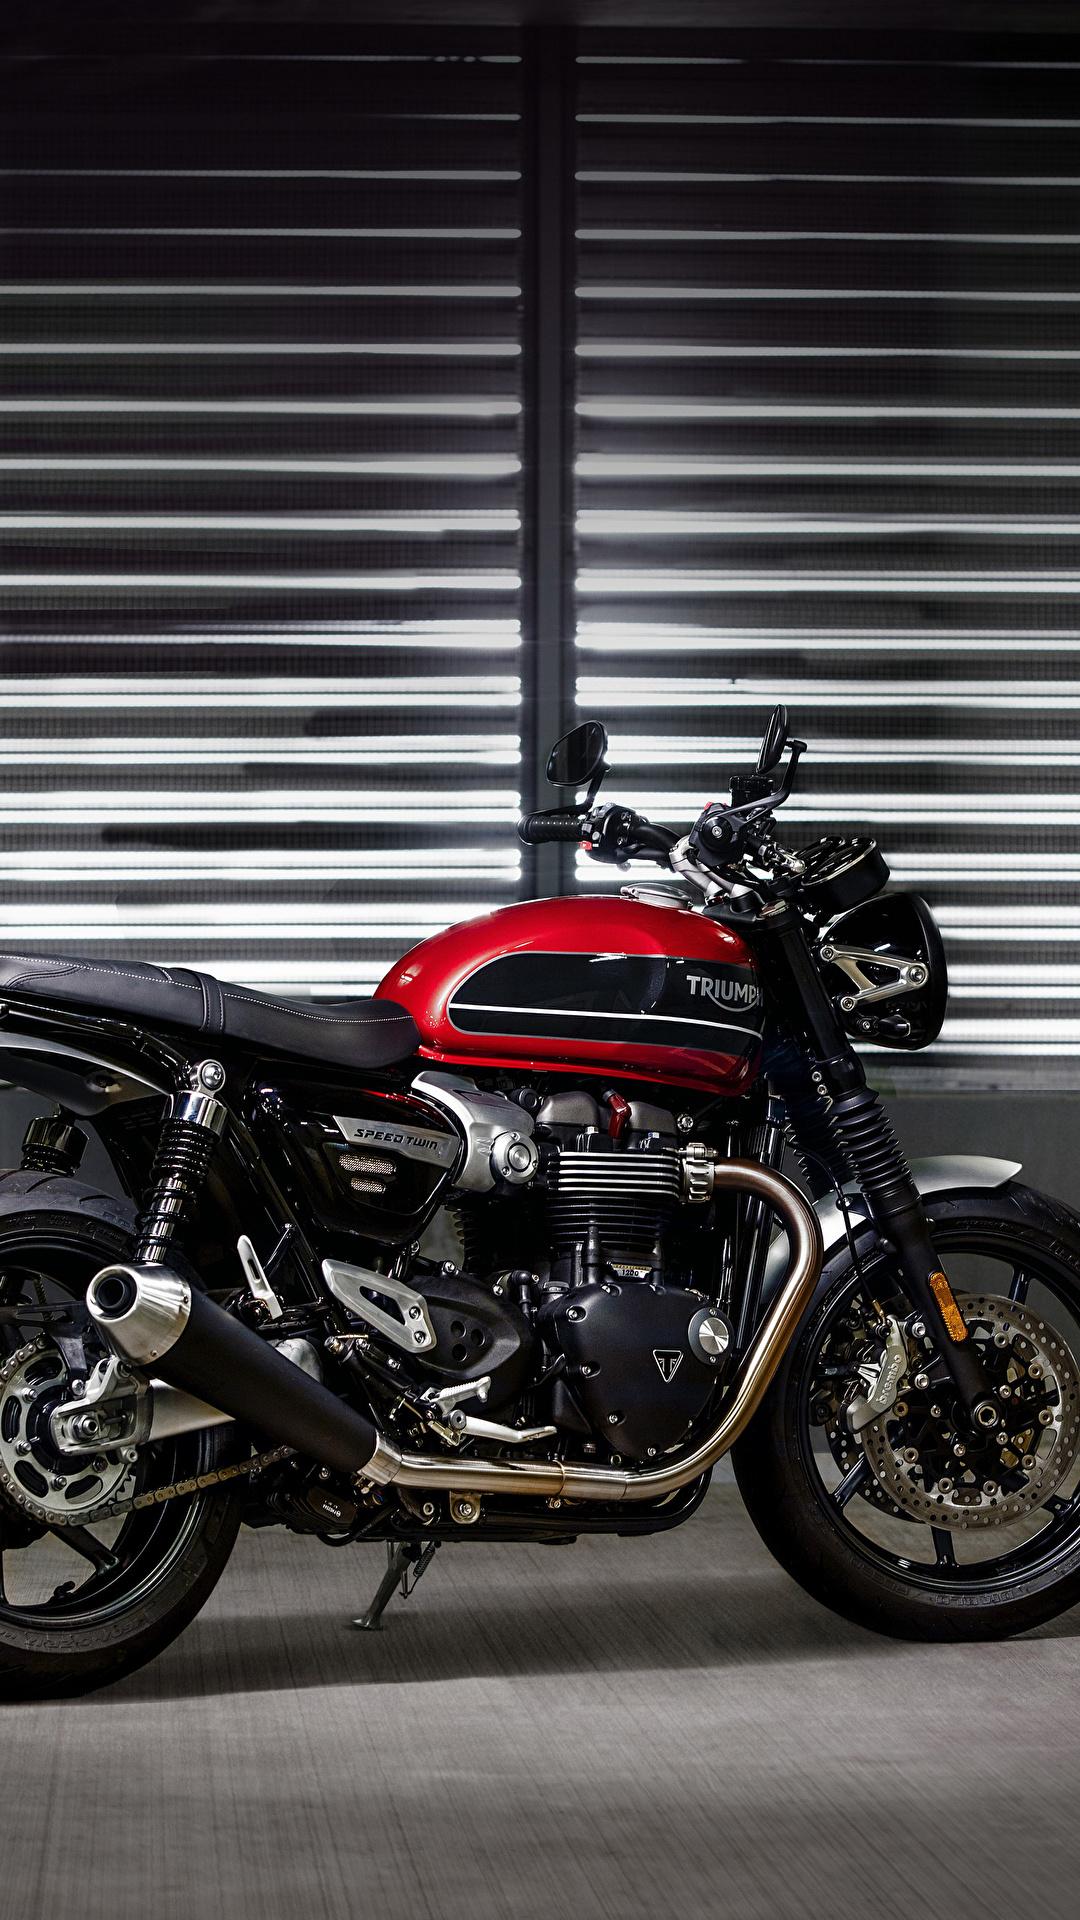 Papeis De Parede 1080x1920 Triumph 2019 Speed Twin Lateralmente Motocicleta Baixar Imagens